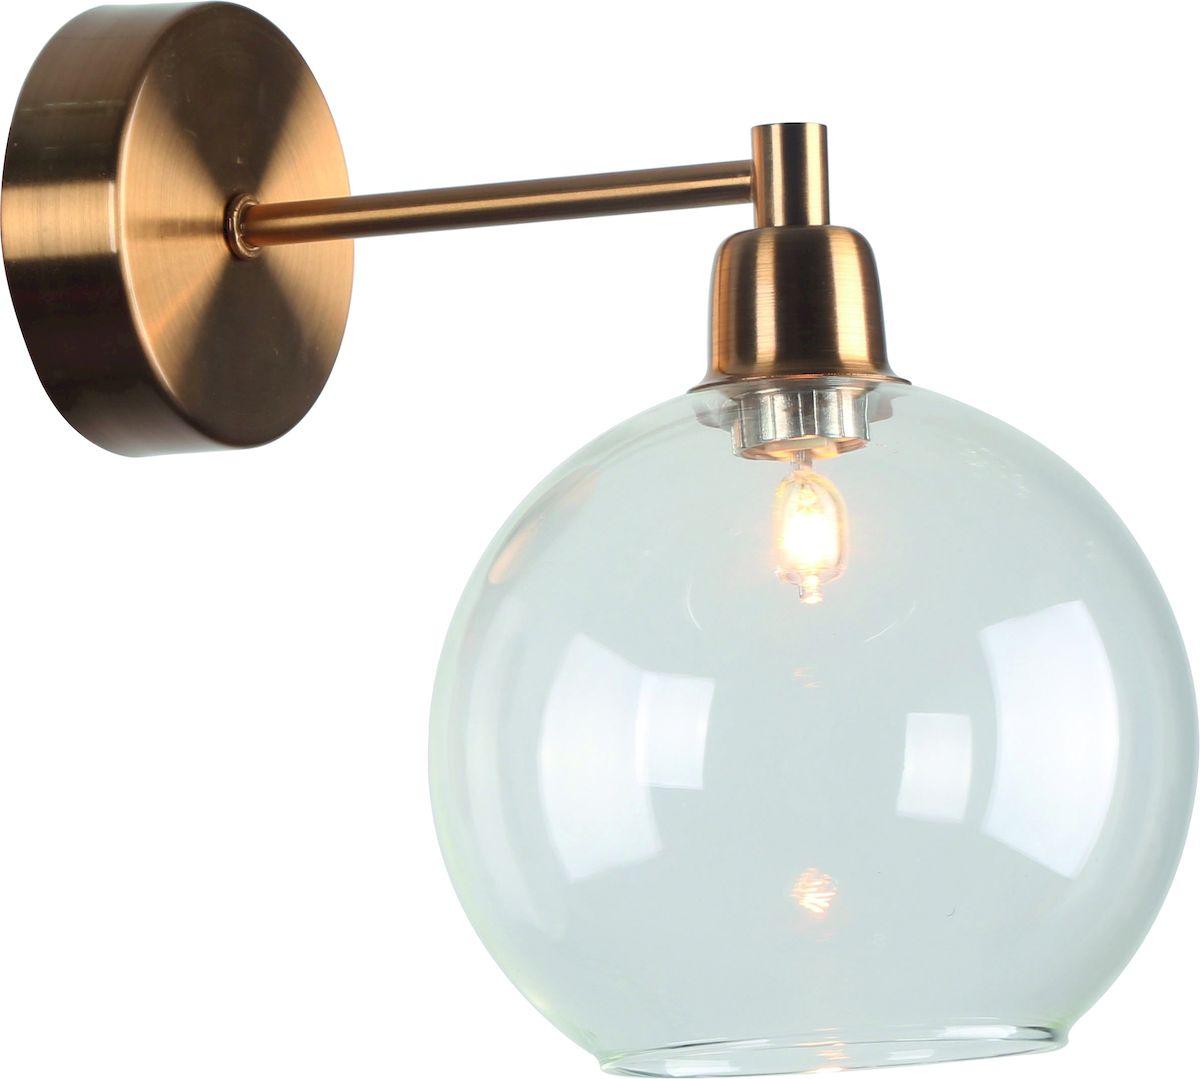 Светильник настенный Arte Lamp ROSARIA A8564AP-1RB arte lamp a8564ap 1rb page 8